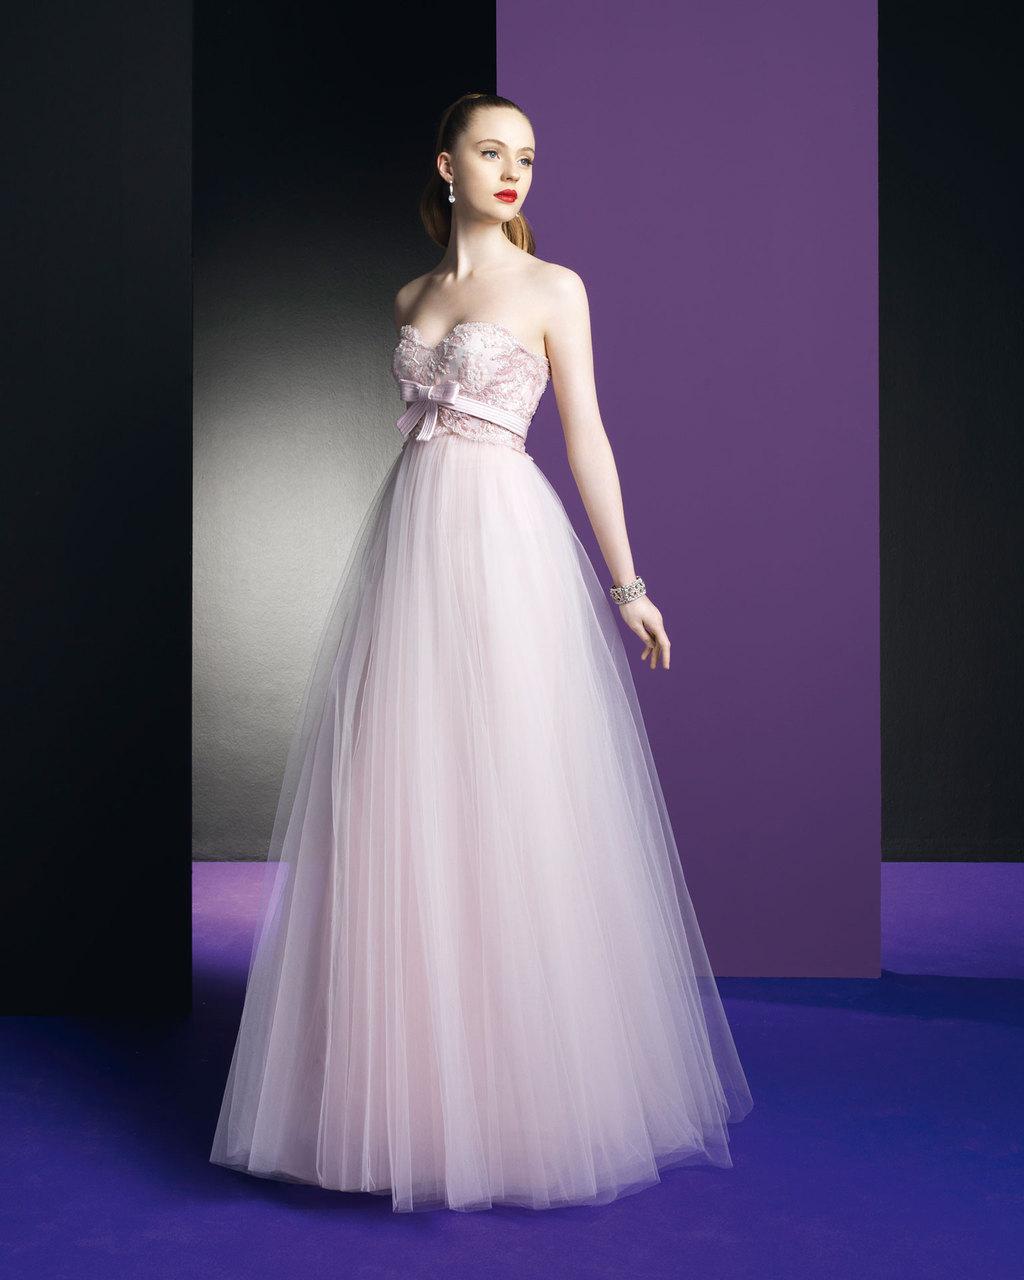 Jessica-biel-bridal-gown-lookalikes-alita-graham-pink-wedding-dress-zuhair-murad.full